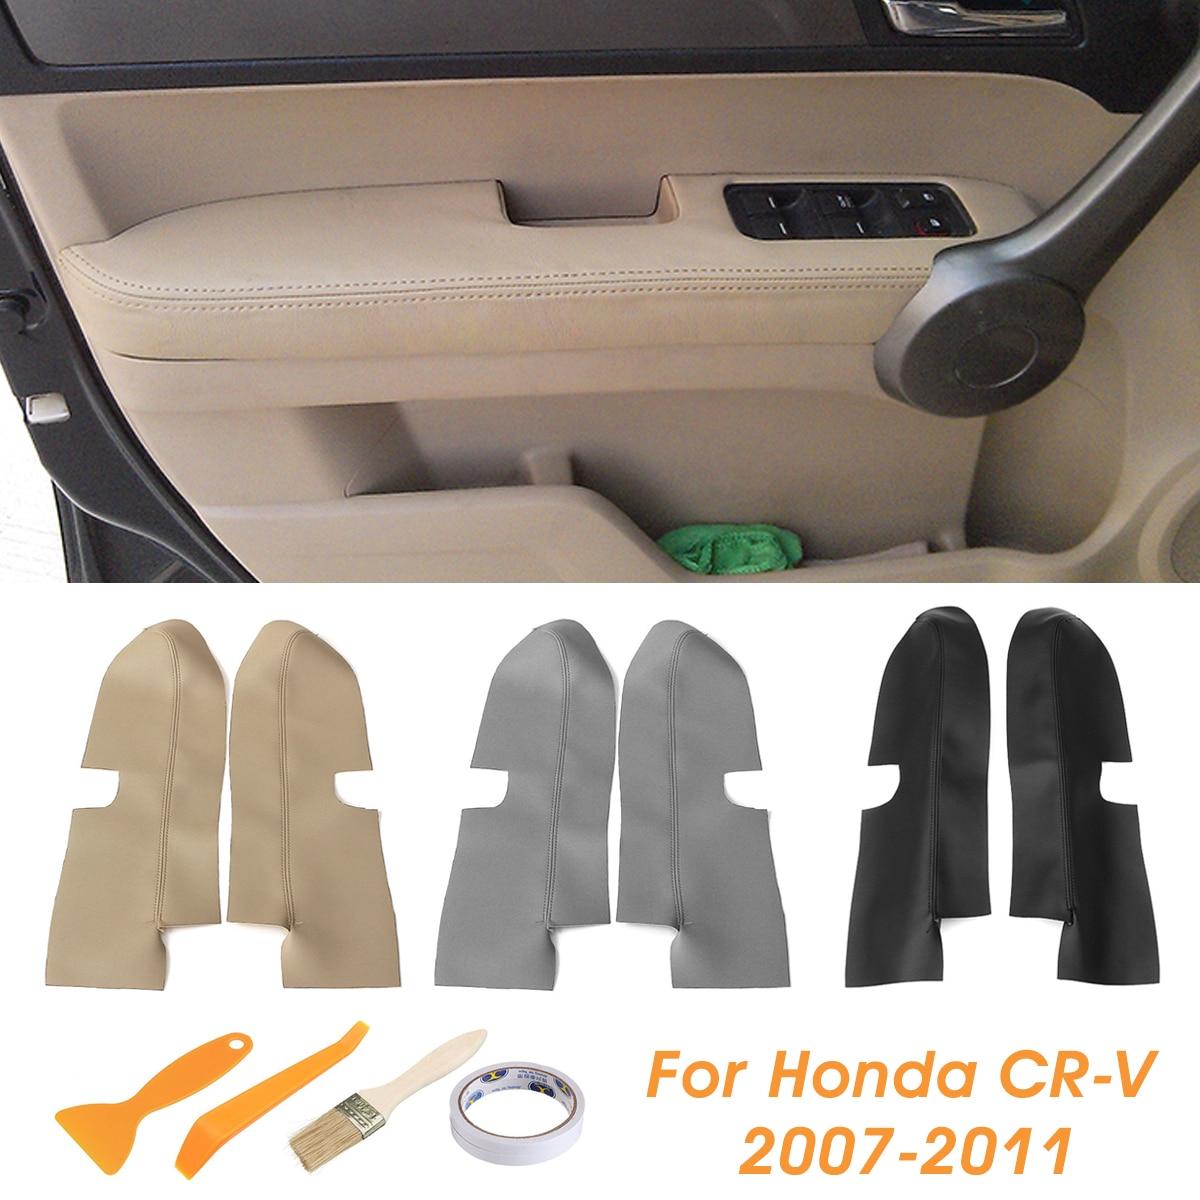 Pair Car Leather Front Door Panels Armrest Cover For Honda CRV 2007 2008 2009 2010 2011 2012 Black/Beige/GreyPair Car Leather Front Door Panels Armrest Cover For Honda CRV 2007 2008 2009 2010 2011 2012 Black/Beige/Grey